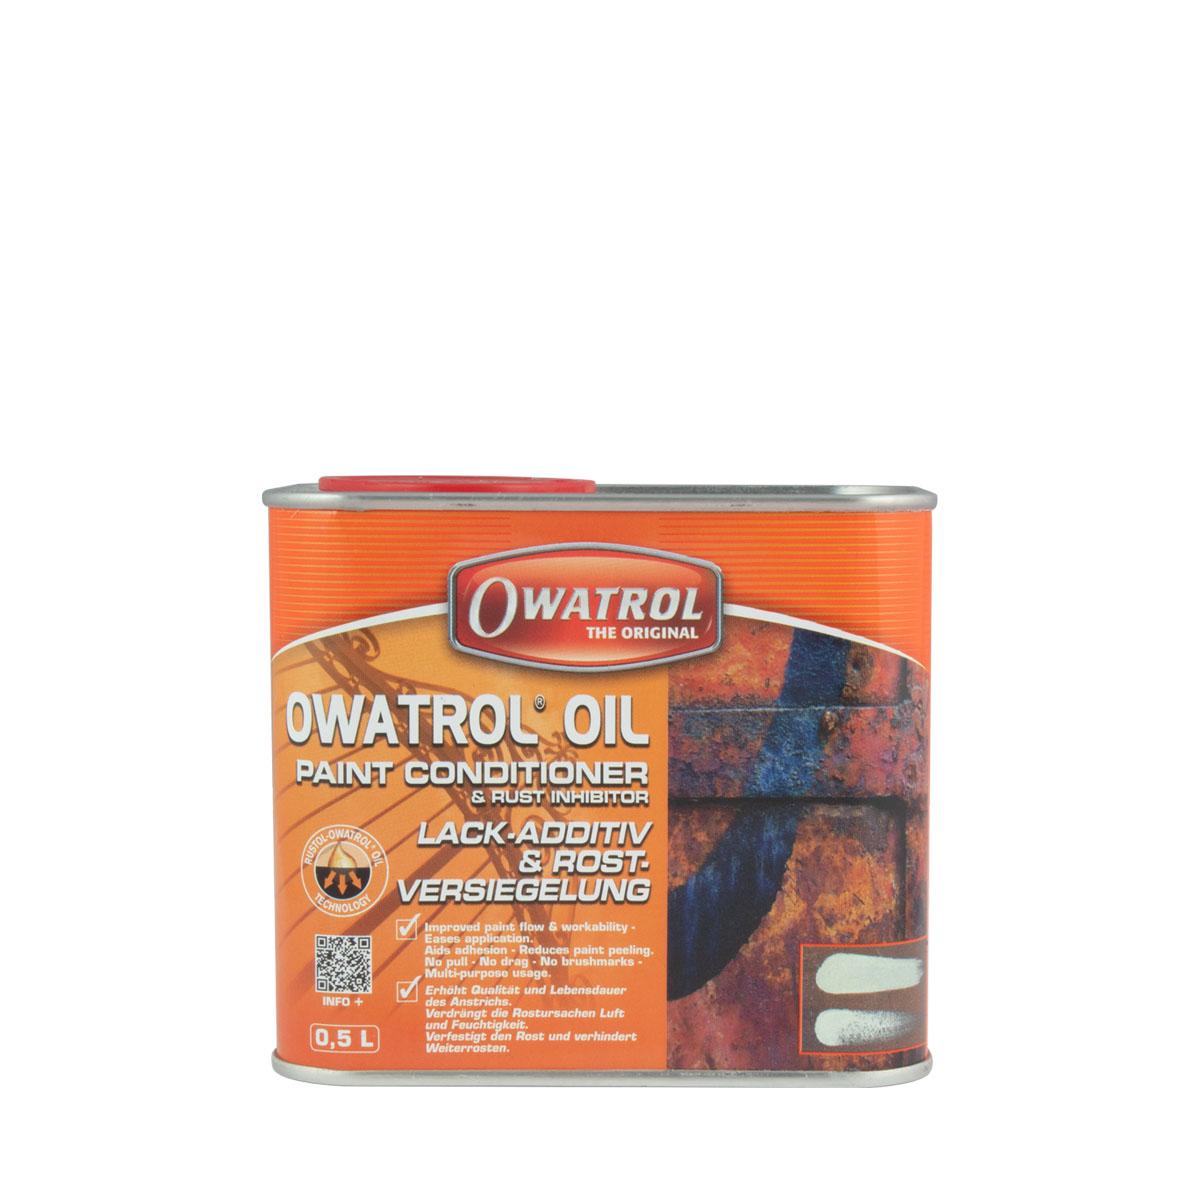 Owatrol Öl 0,5L, Kriechöl, Rostkonservierer, Lackadditiv